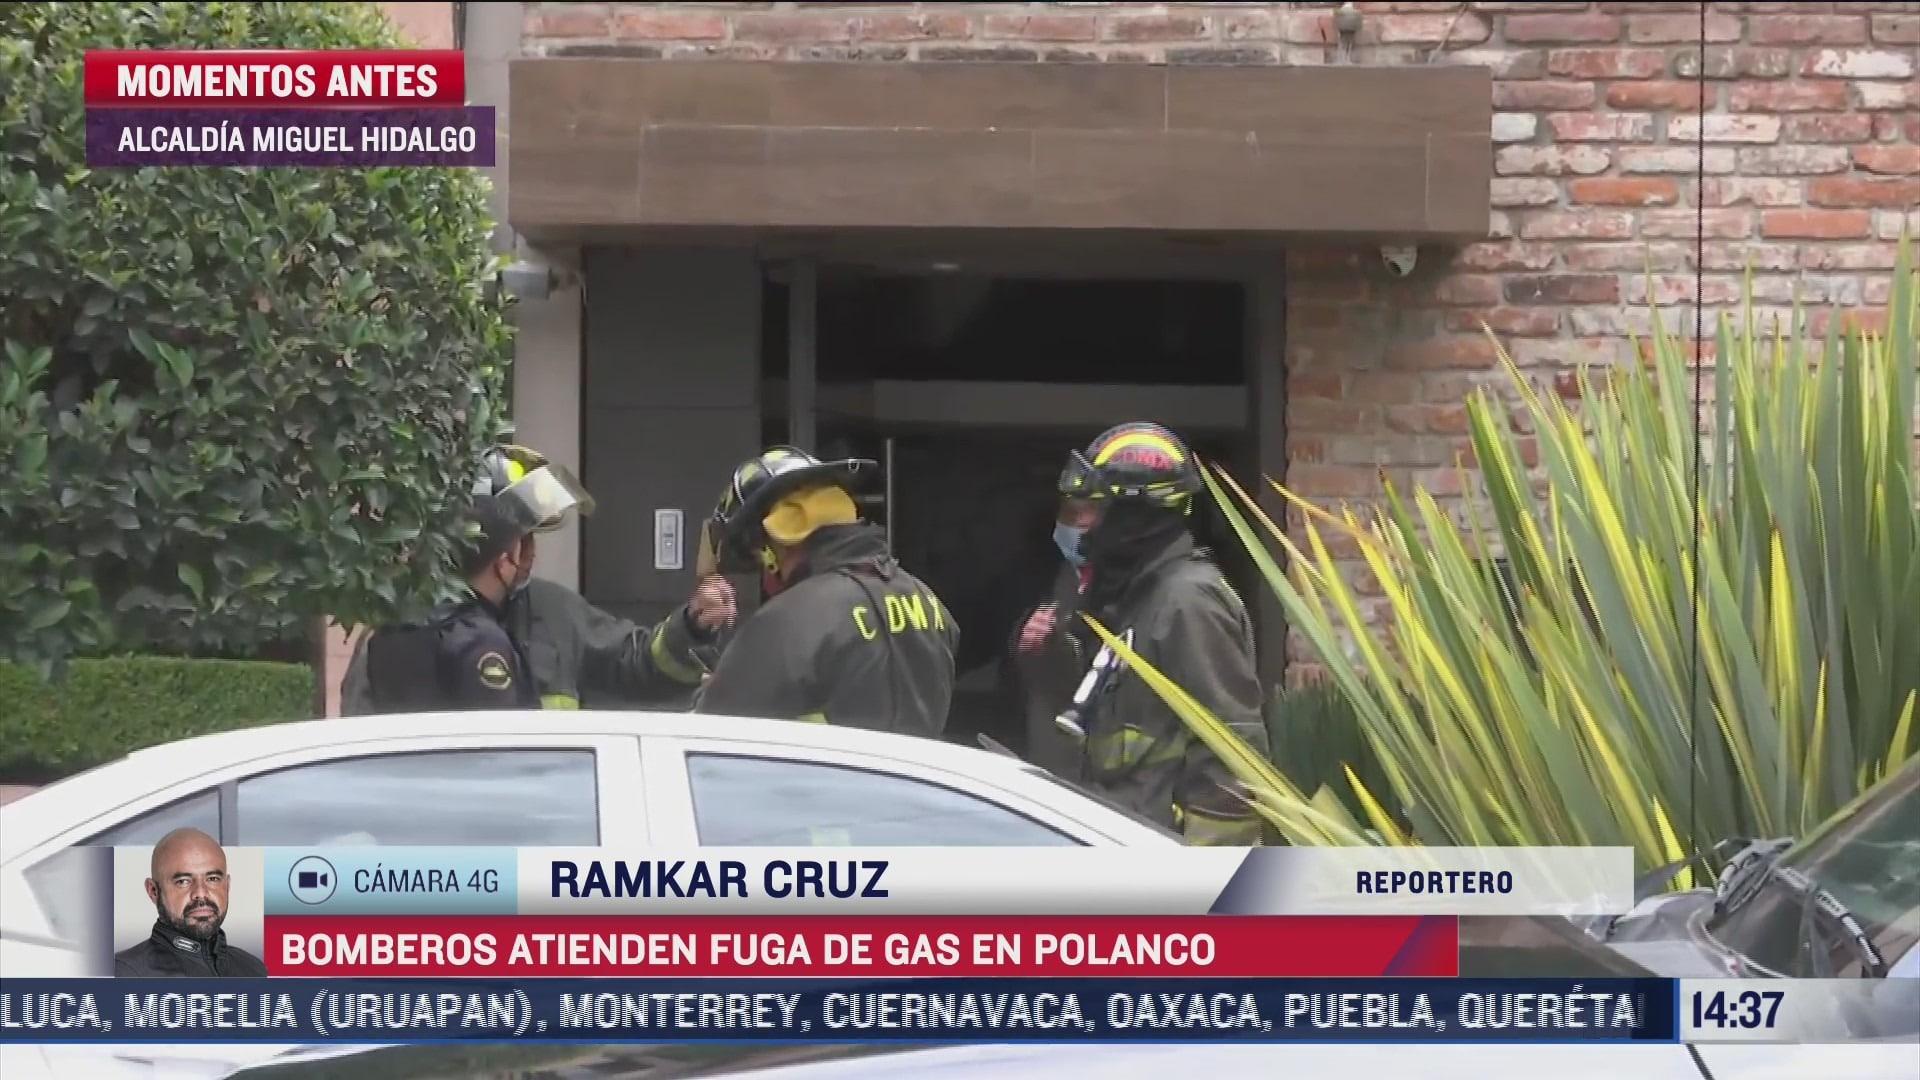 Bomberos atienden fuga de gas en Polanco, CDMX